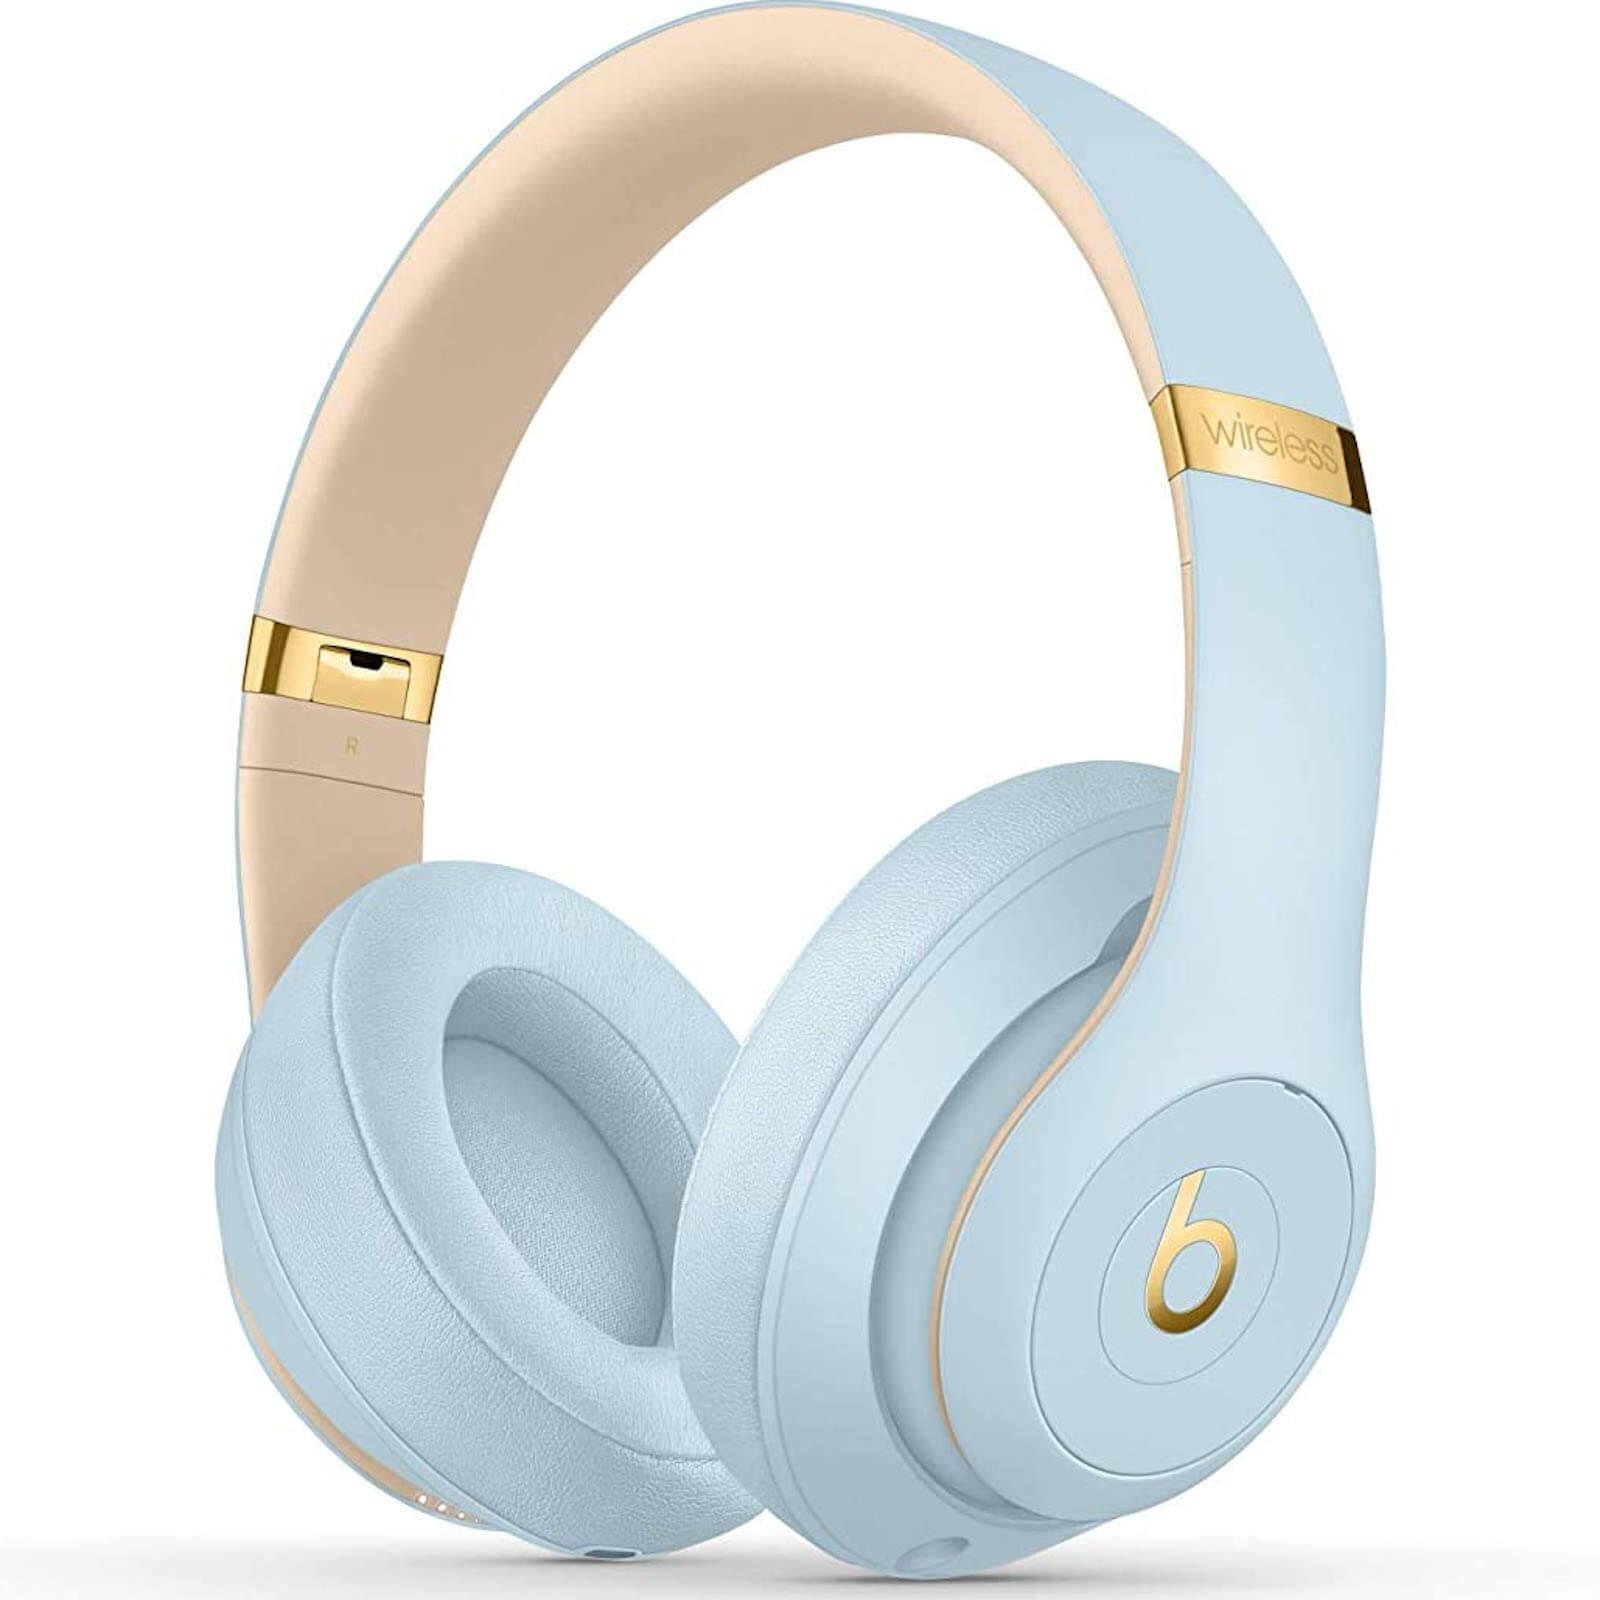 Beats By Dr. Dre Studio3 Bluetooth Wireless On-Ear Headphones - Crystal Blue £174.99 at Zavvi